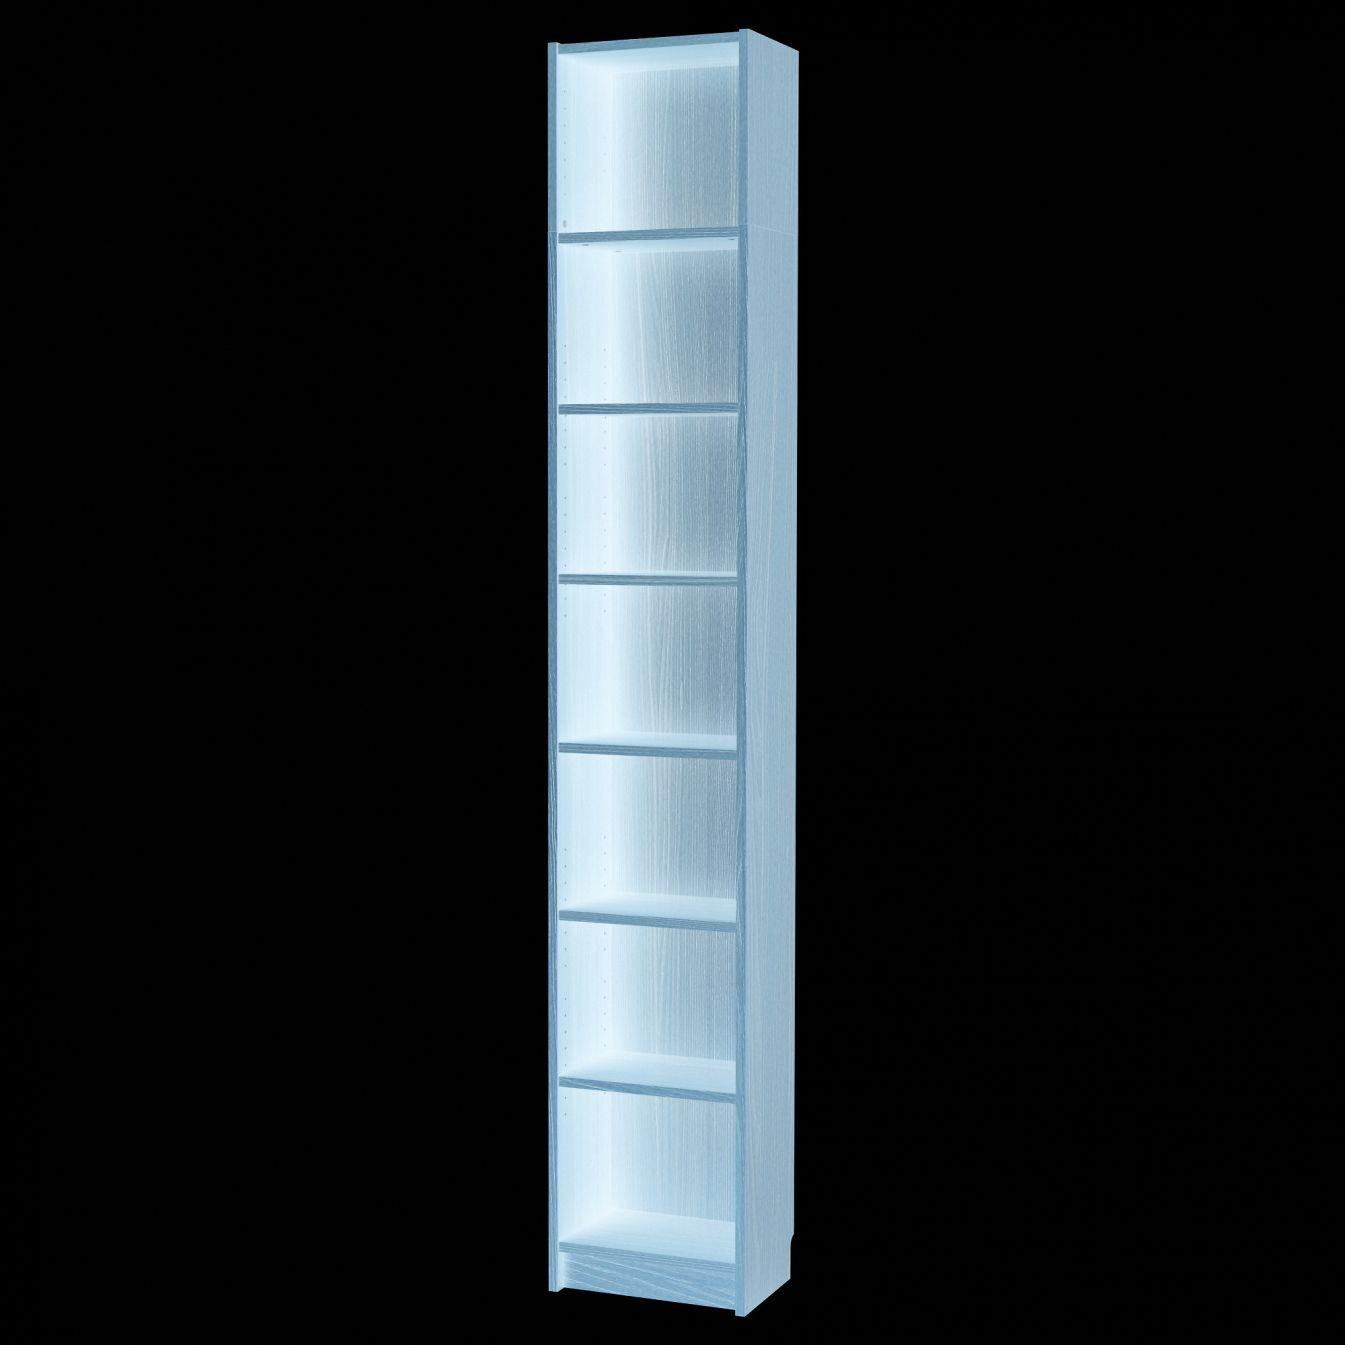 10 Inch Wide Bookcase